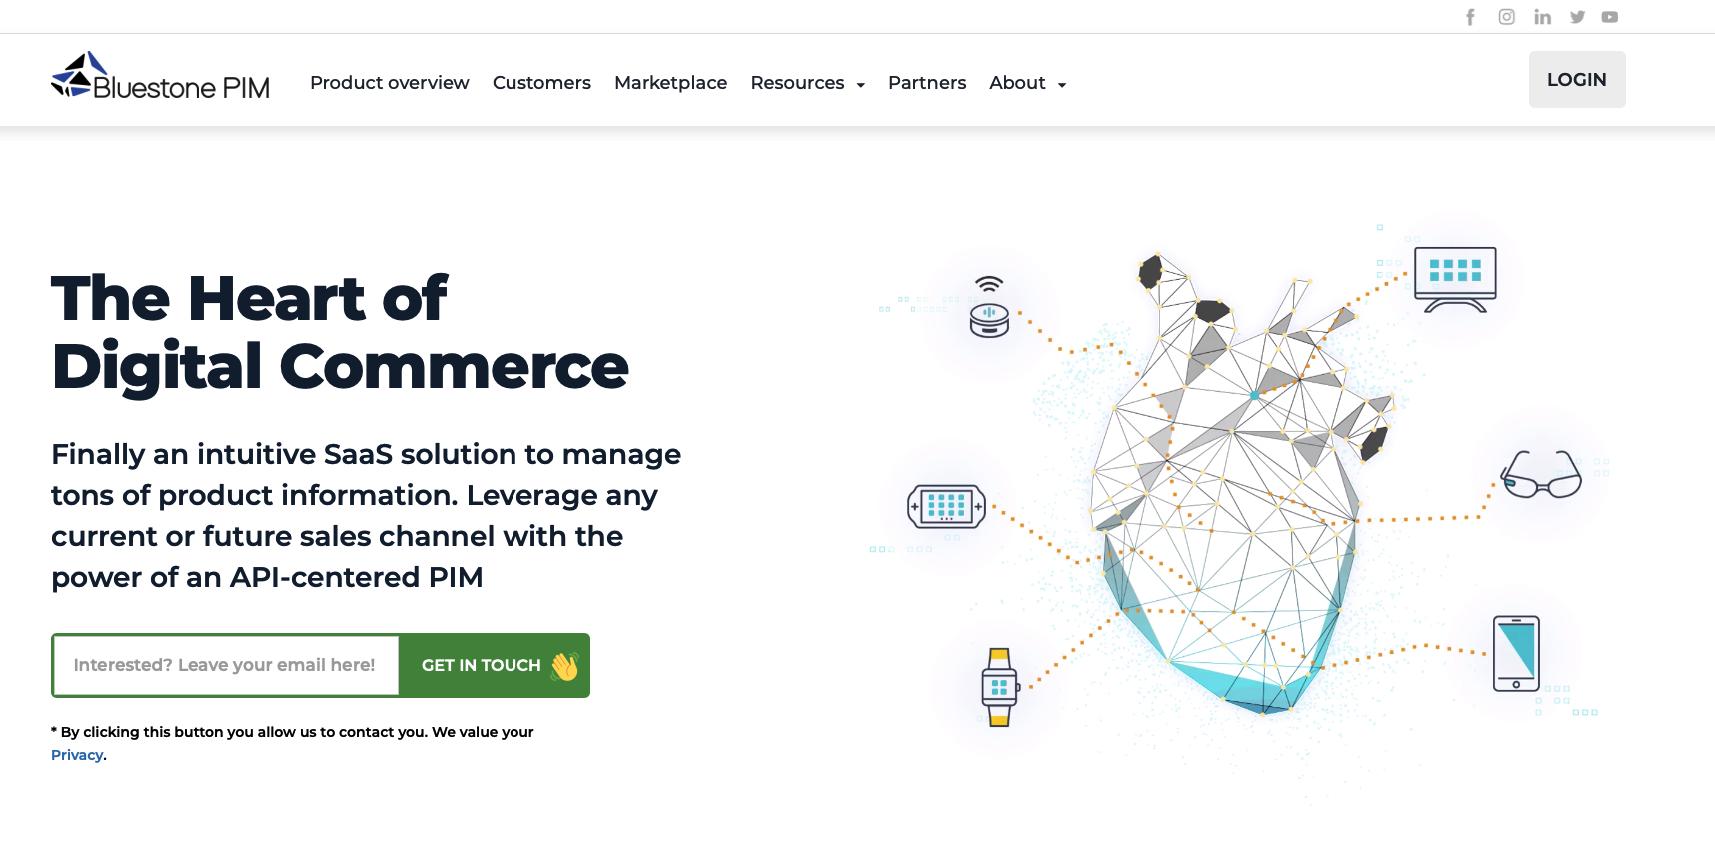 Review Bluestone PIM: The Heart of Digital Commerce - appvizer